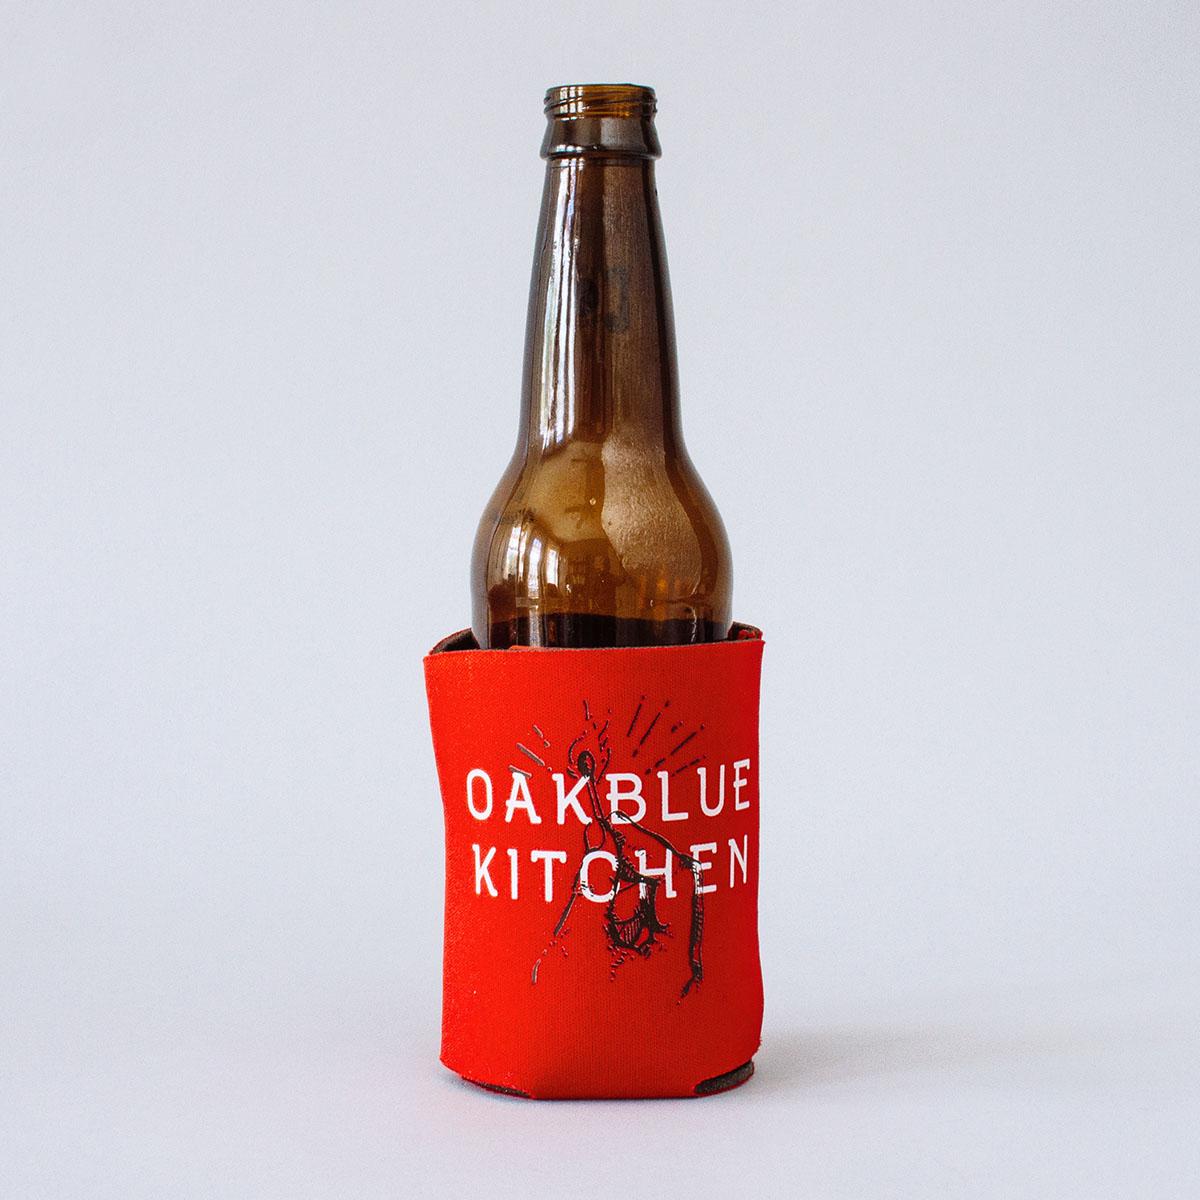 oakblue kitchen beer koozie